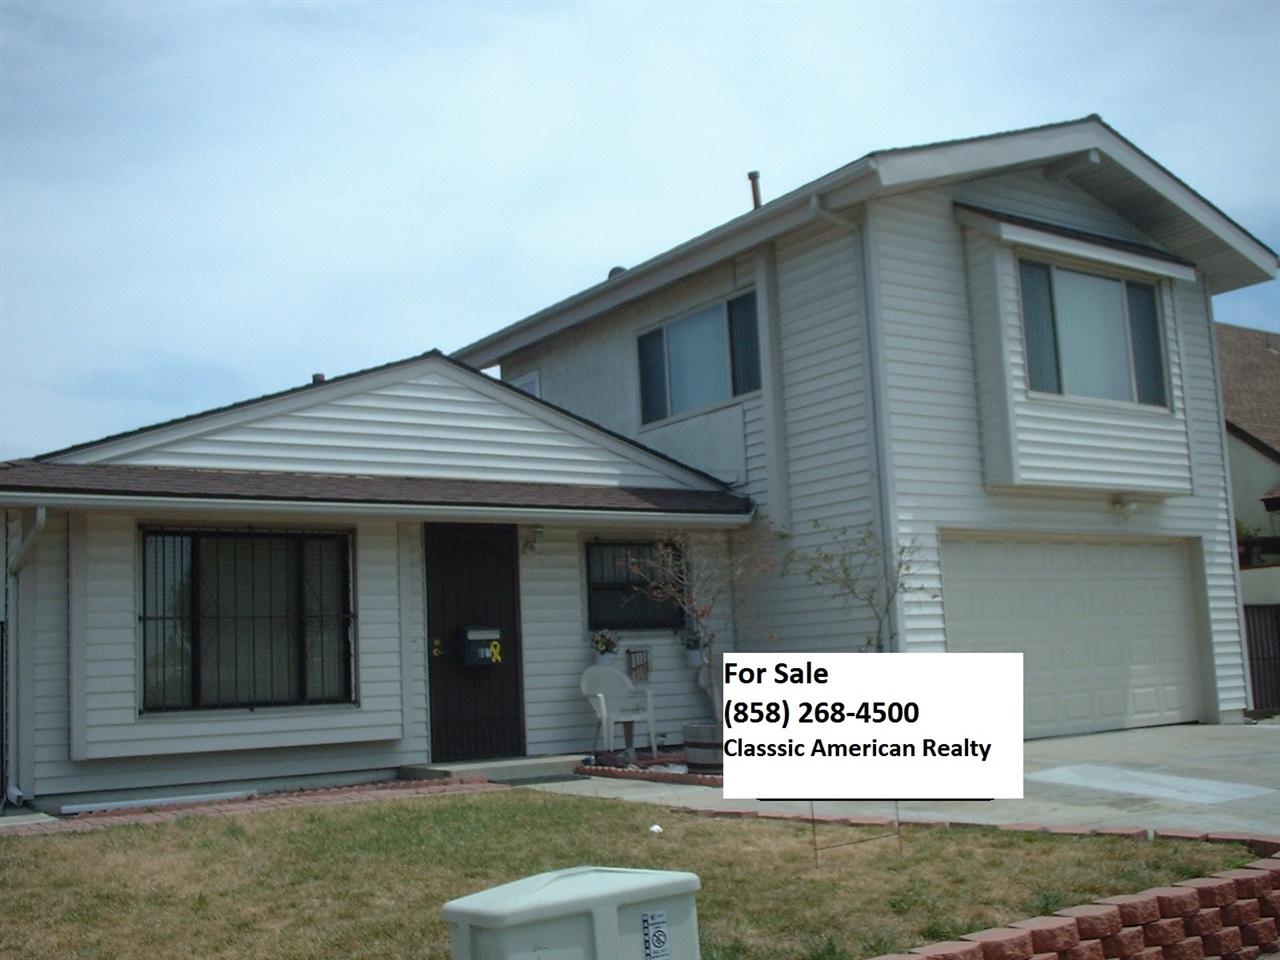 861 Twining Ave, San Diego, CA